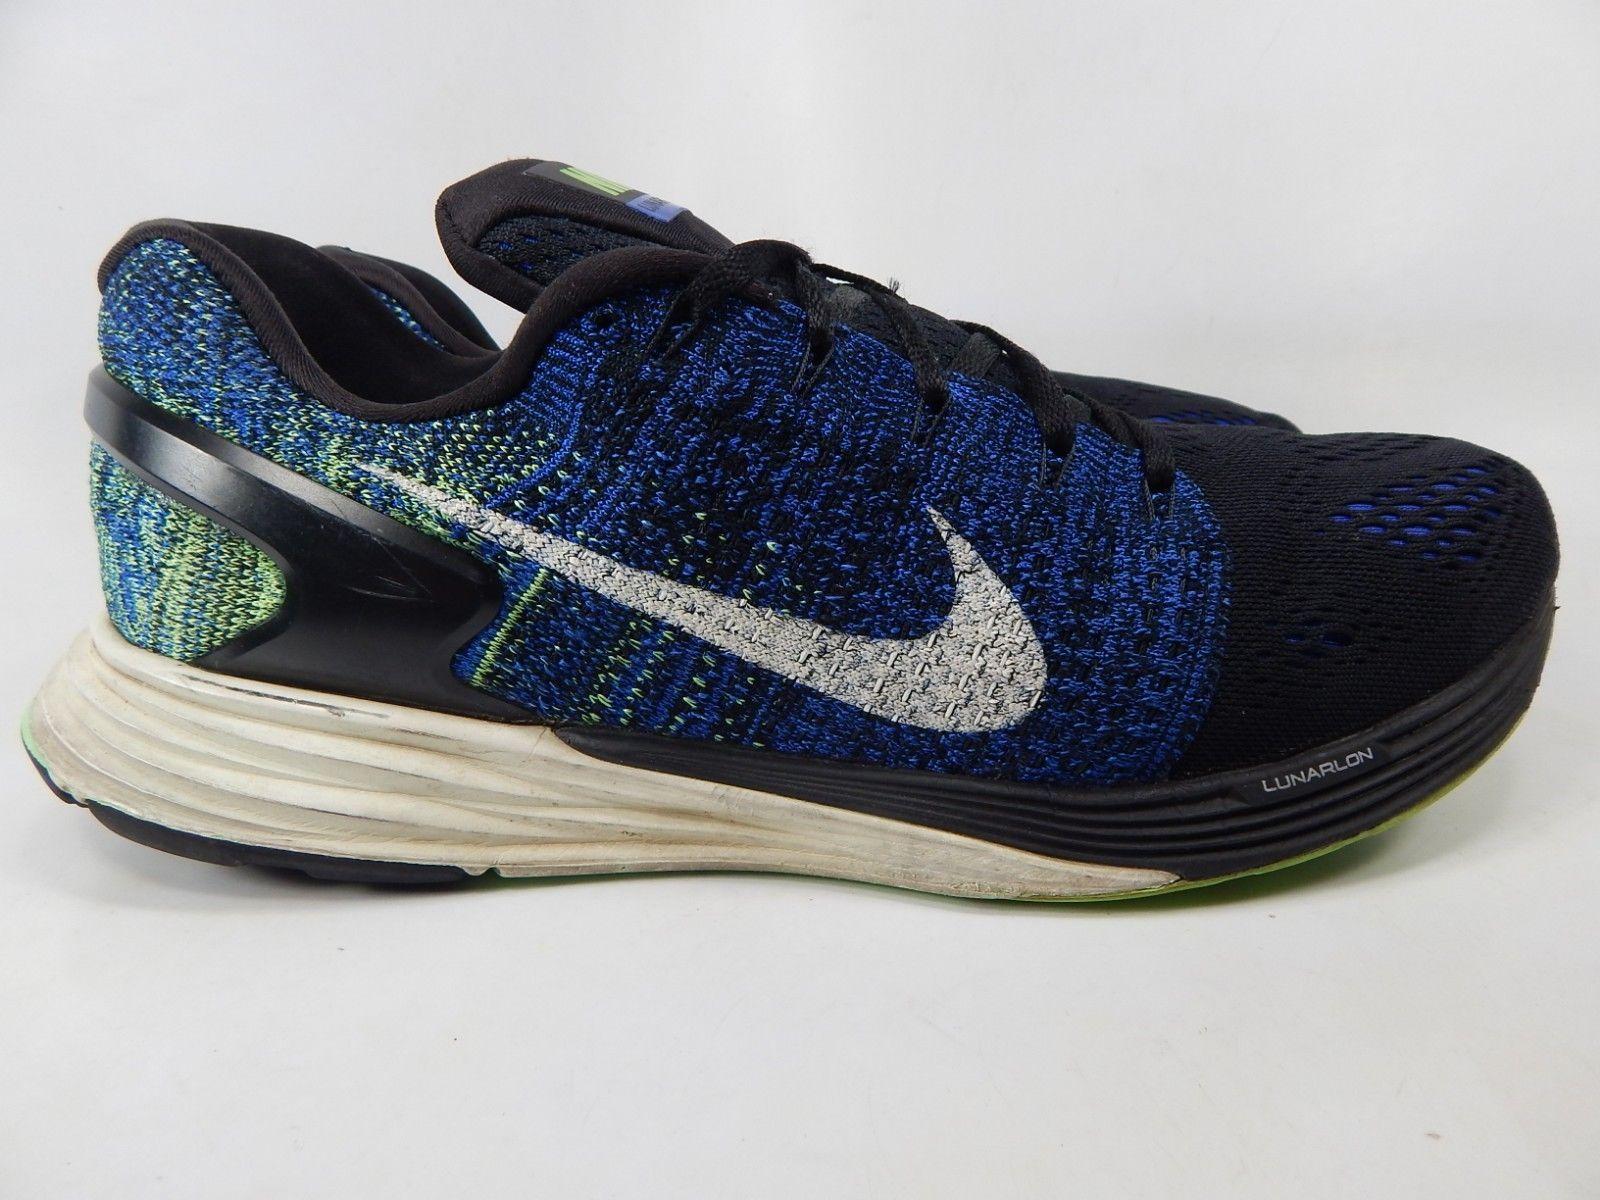 8ab2ff6b4b9a8 Nike Lunarglide 7 Size 13 M (D) EU 47.5 Mens and similar items